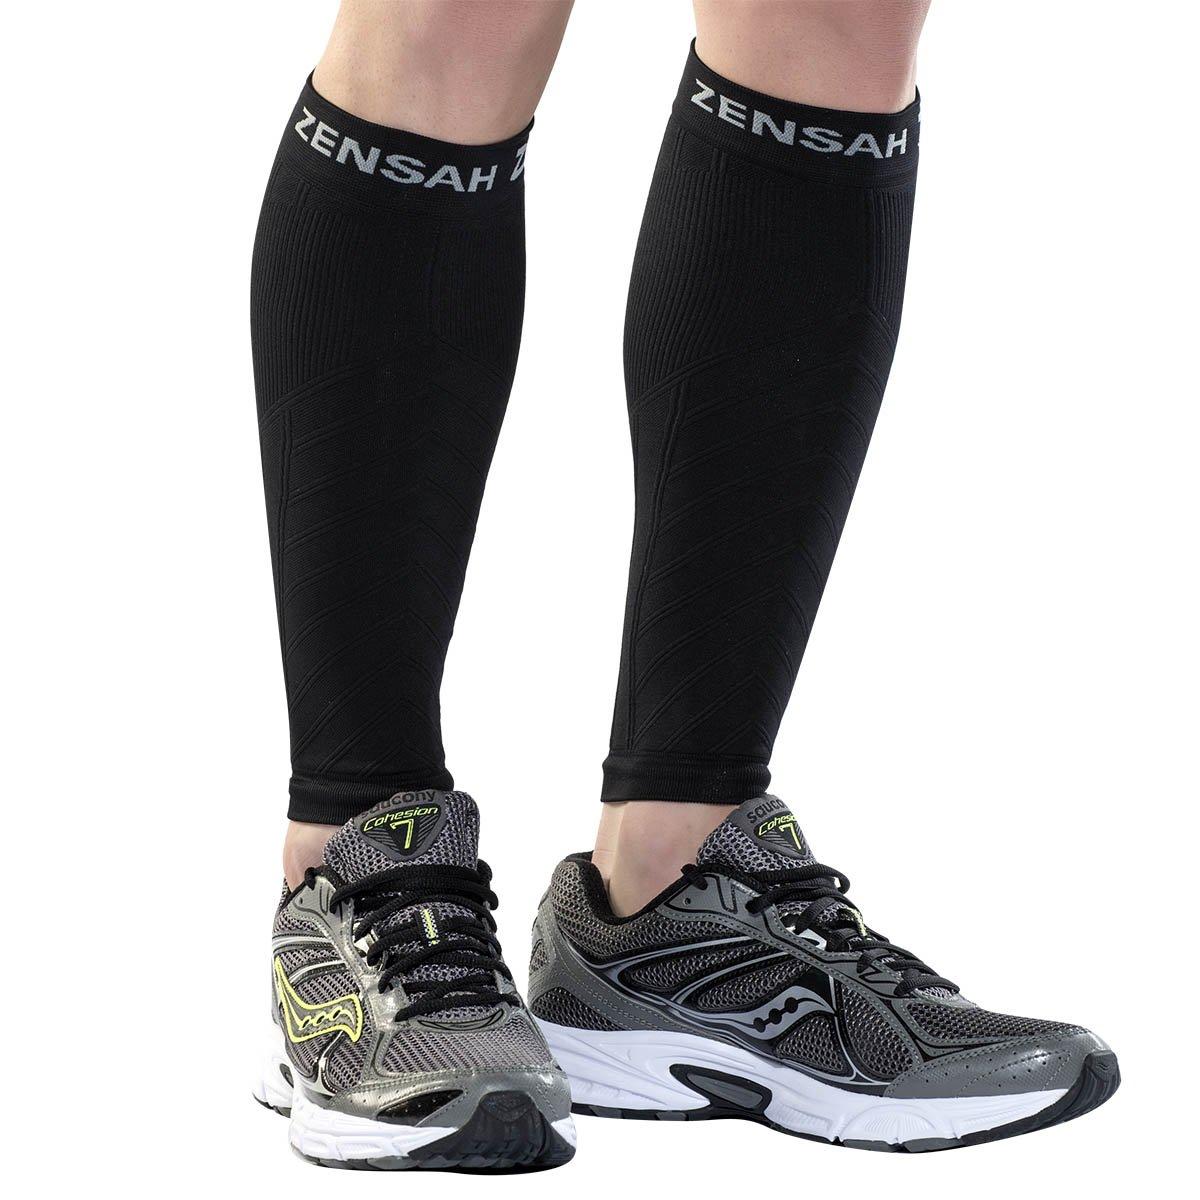 Zensah  Compression Leg Sleeves, Black, Large/X-Large by Zensah